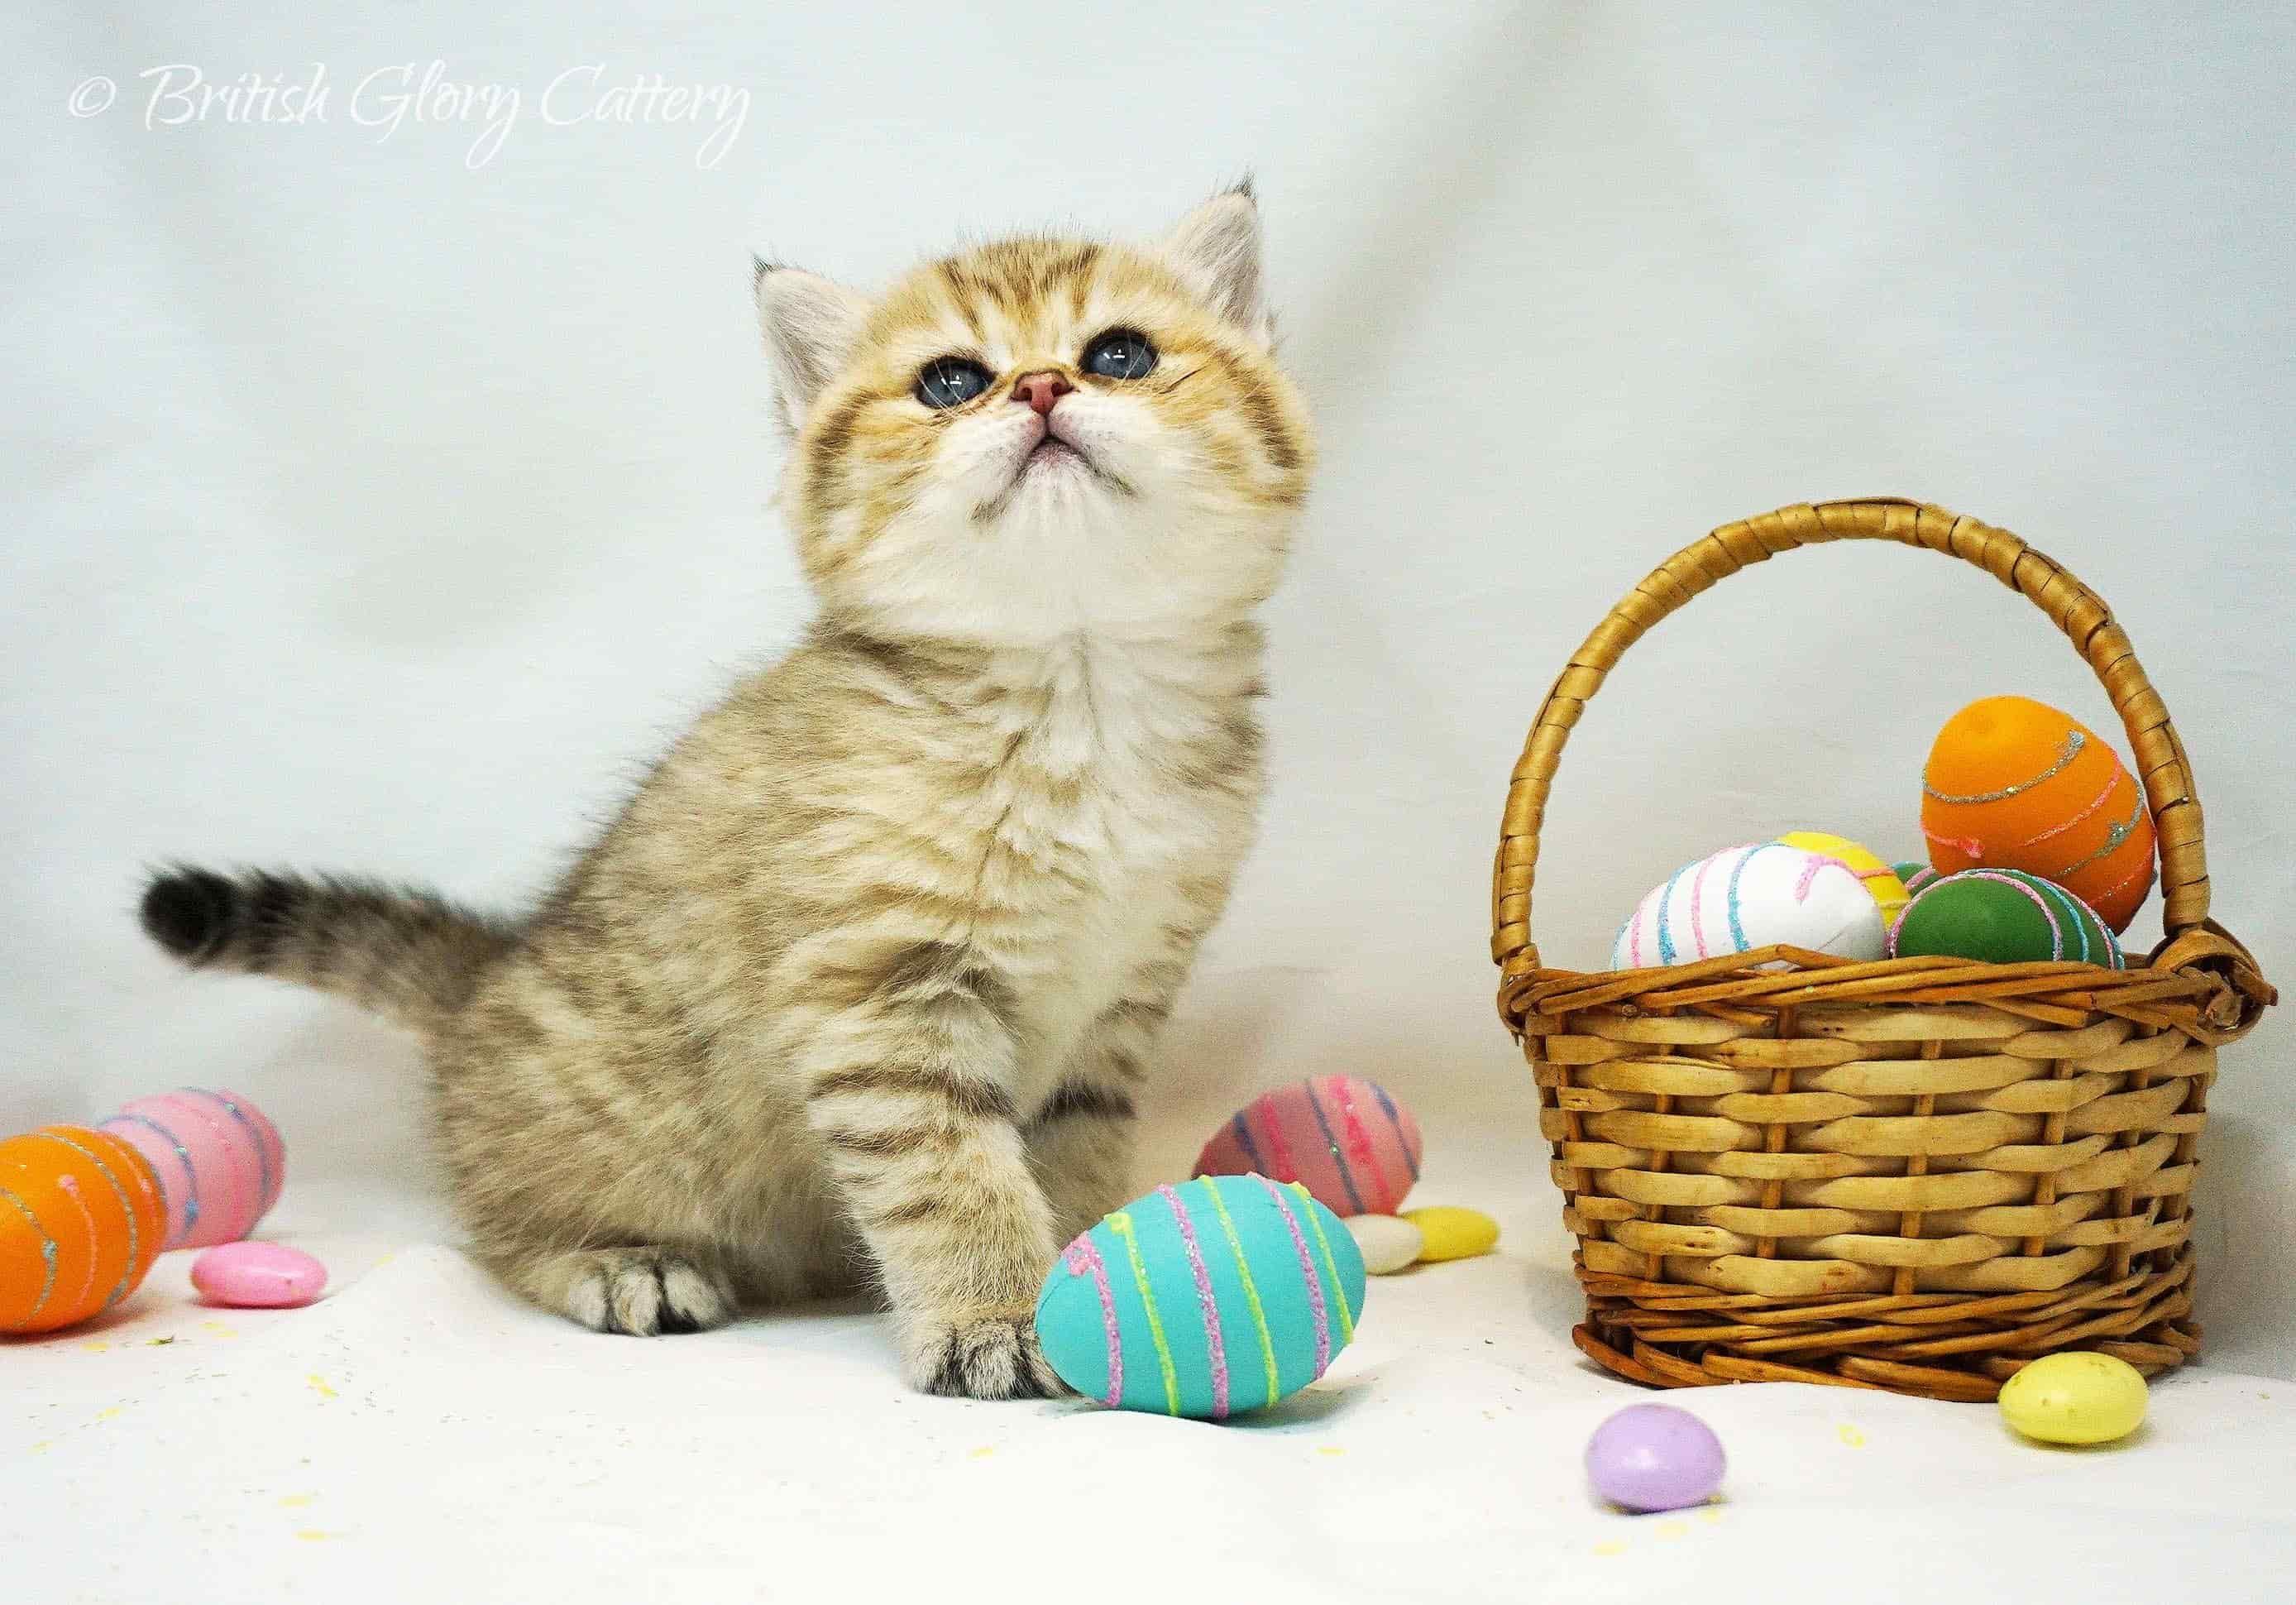 British shorthair golden kittenin